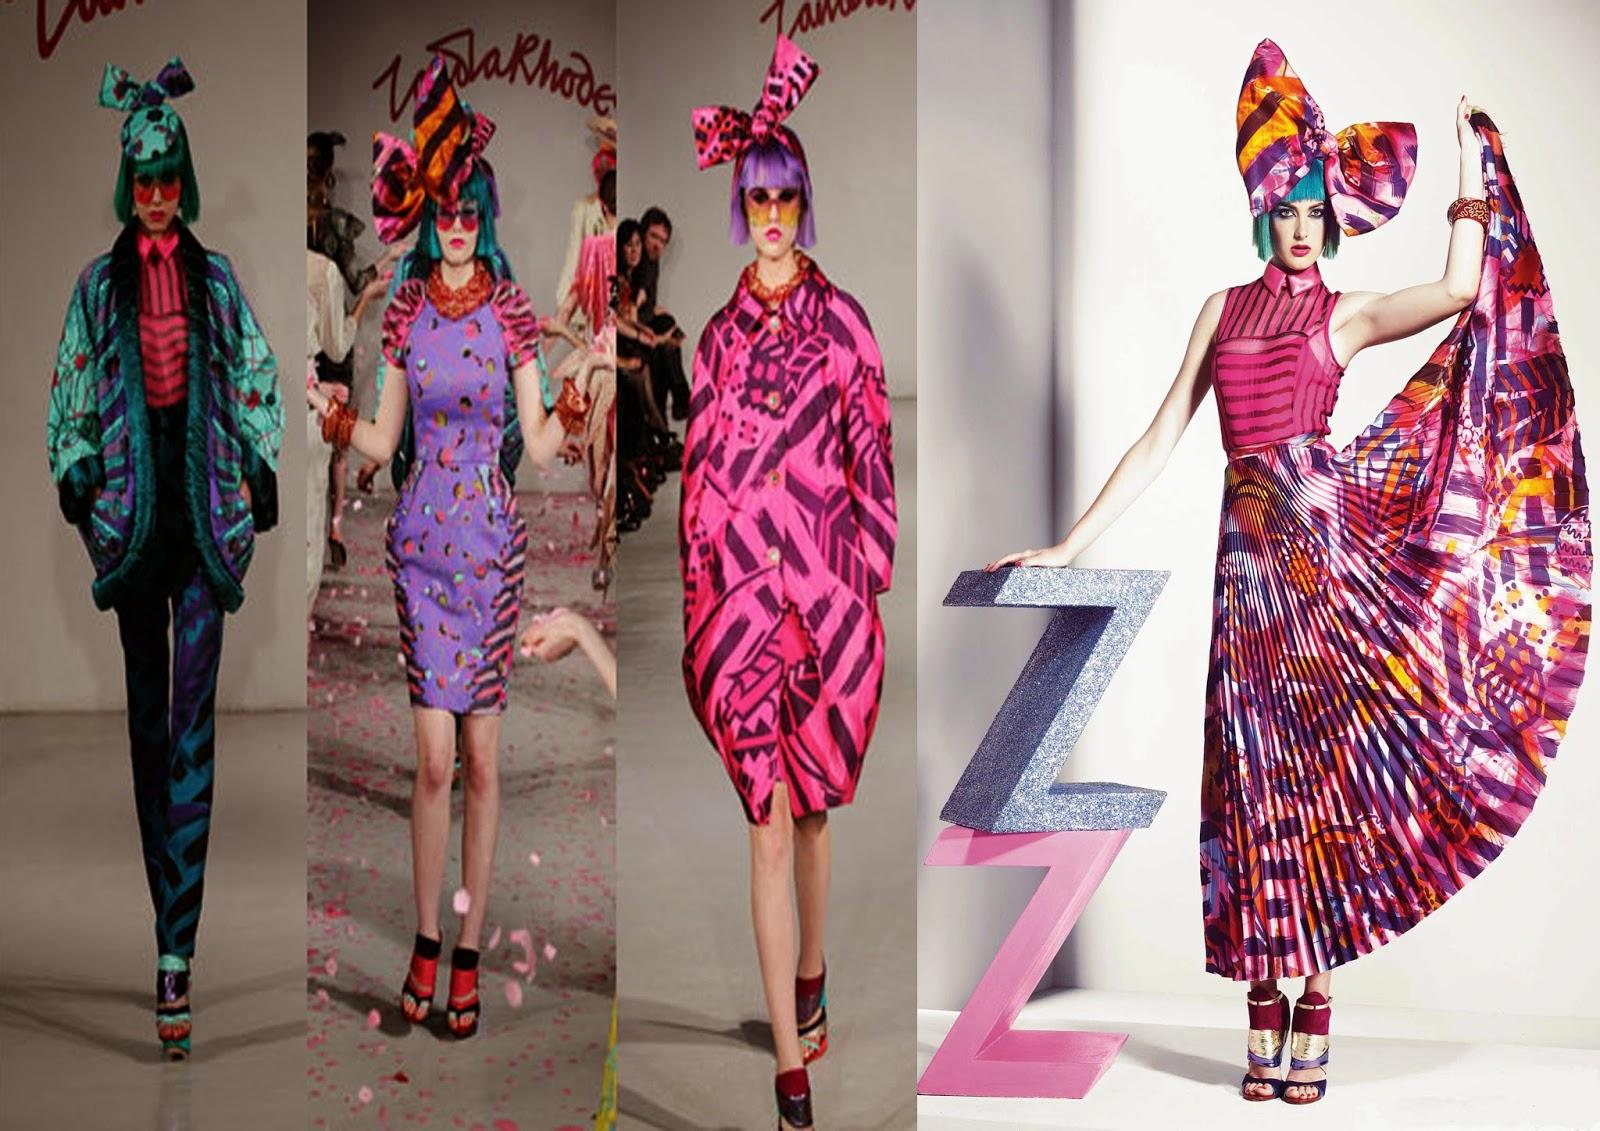 Quick Q&A with Hilary Alexander & Fashion Designer Zandra Rhodes ...